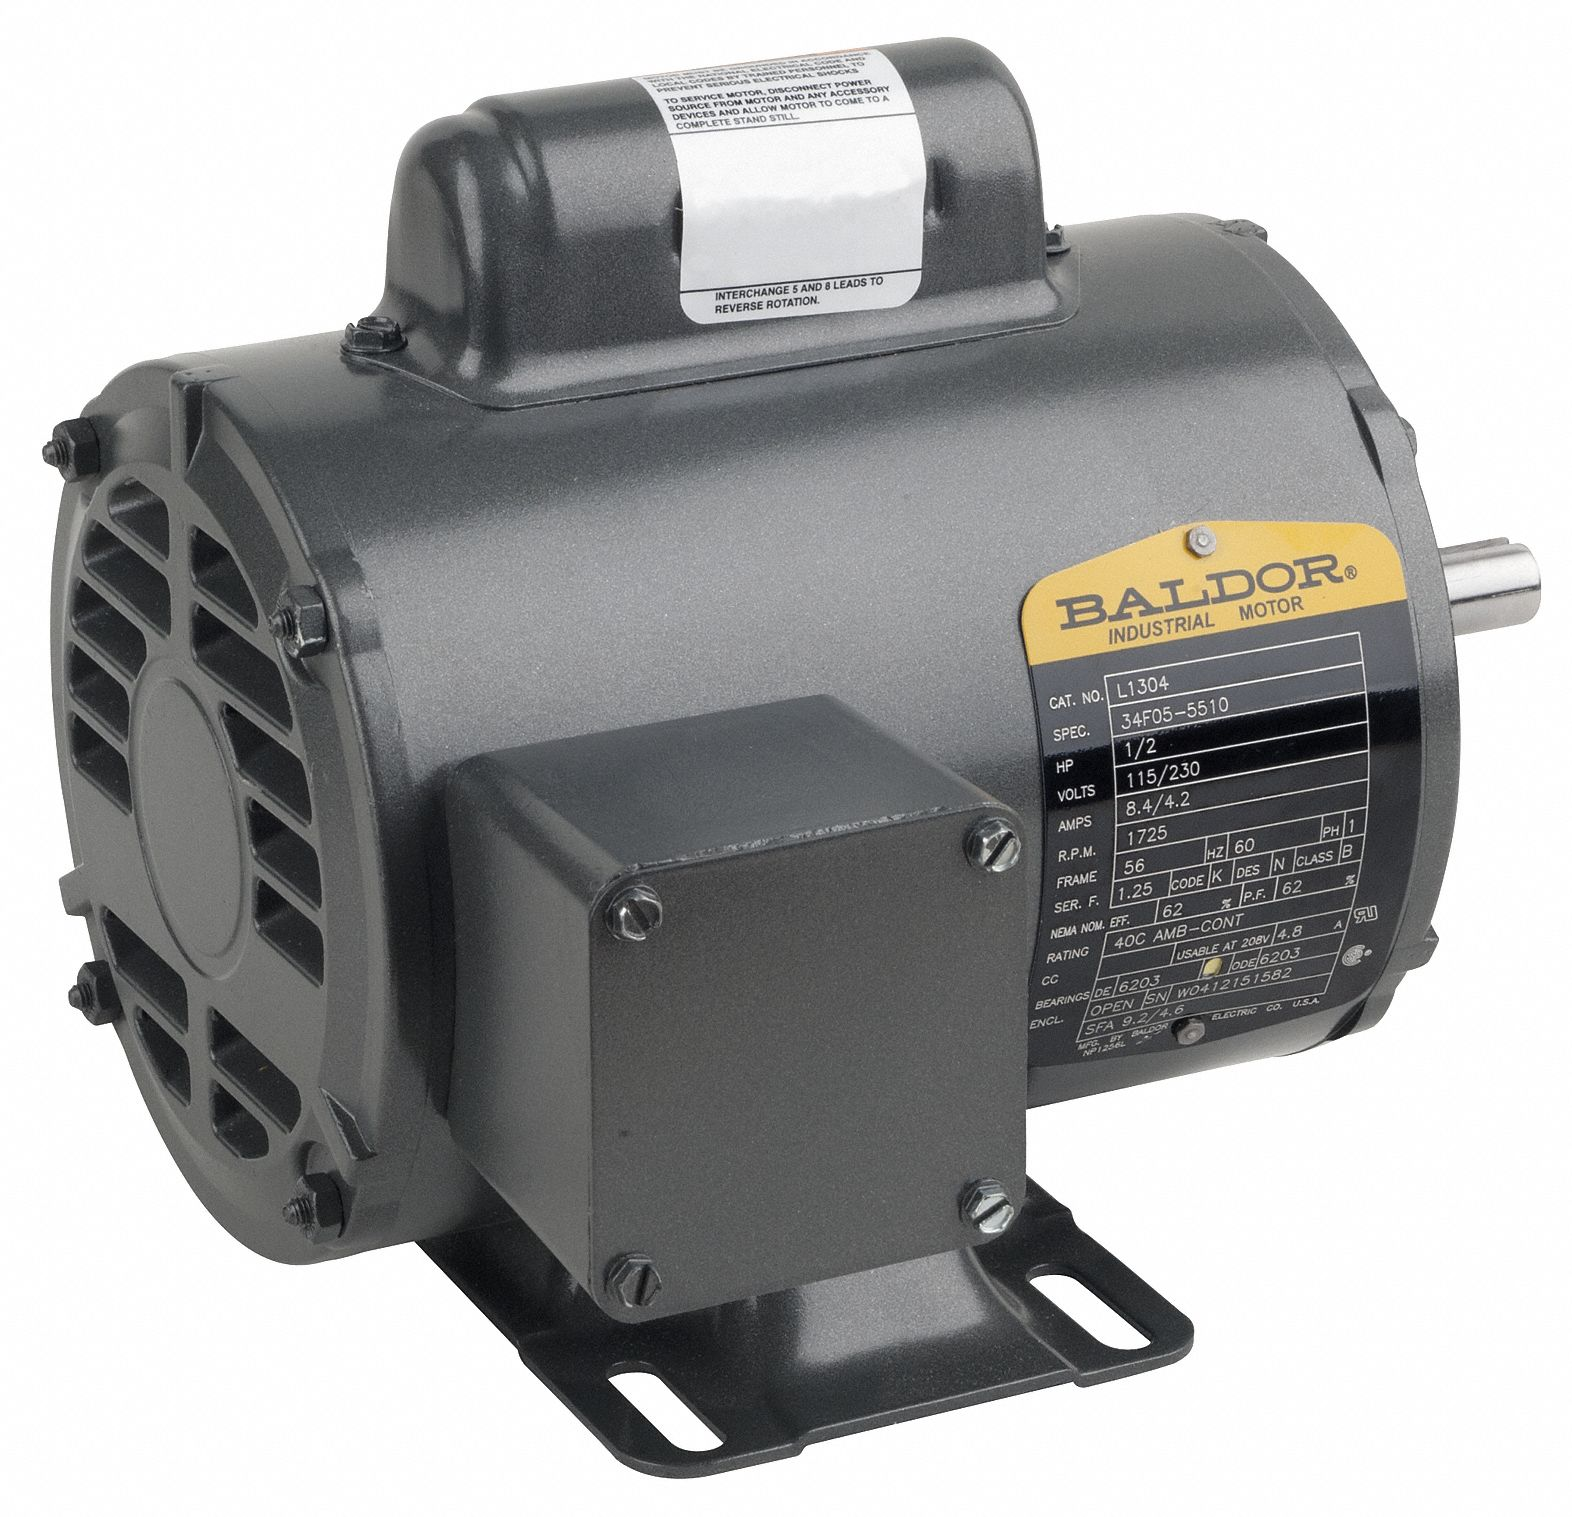 electric generator motor. BALDOR ELECTRIC 10 HP General Purpose Motor,Capacitor-Start,1740 Nameplate RPM,Voltage 230,Frame 213TC - 38G310 CL3712T Grainger Electric Generator Motor